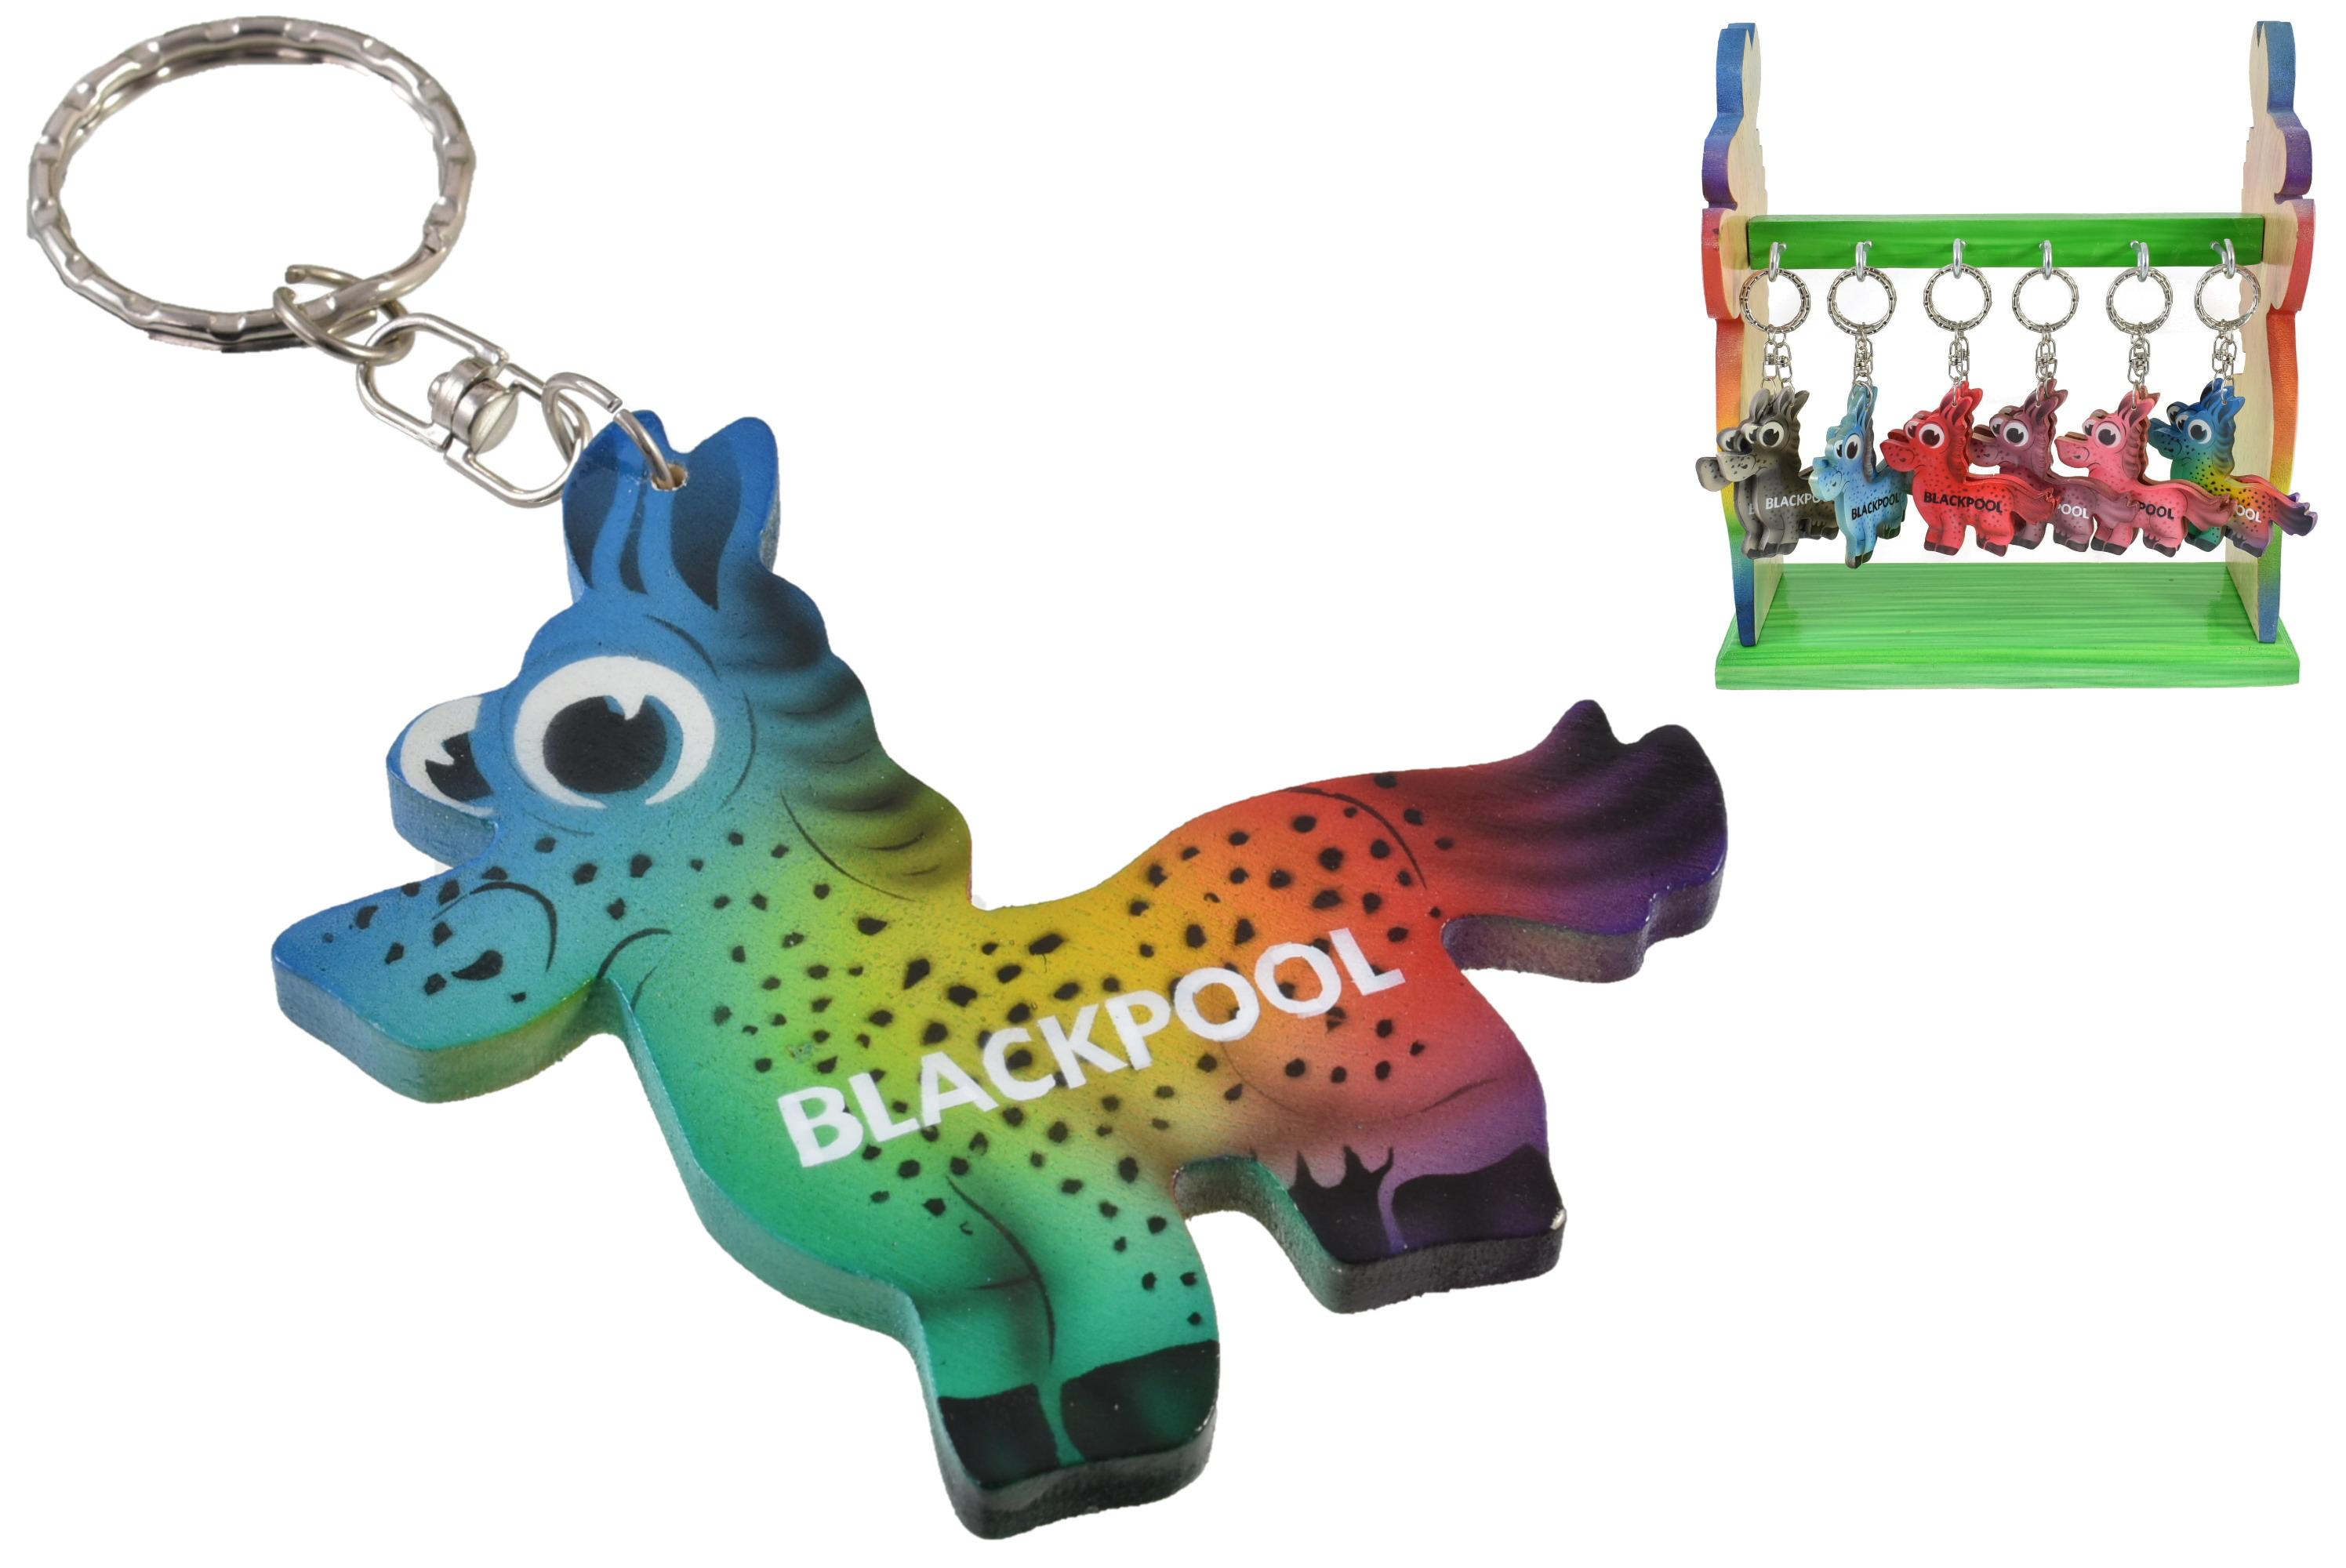 Blackpool Donkey Keyring On Display Stand